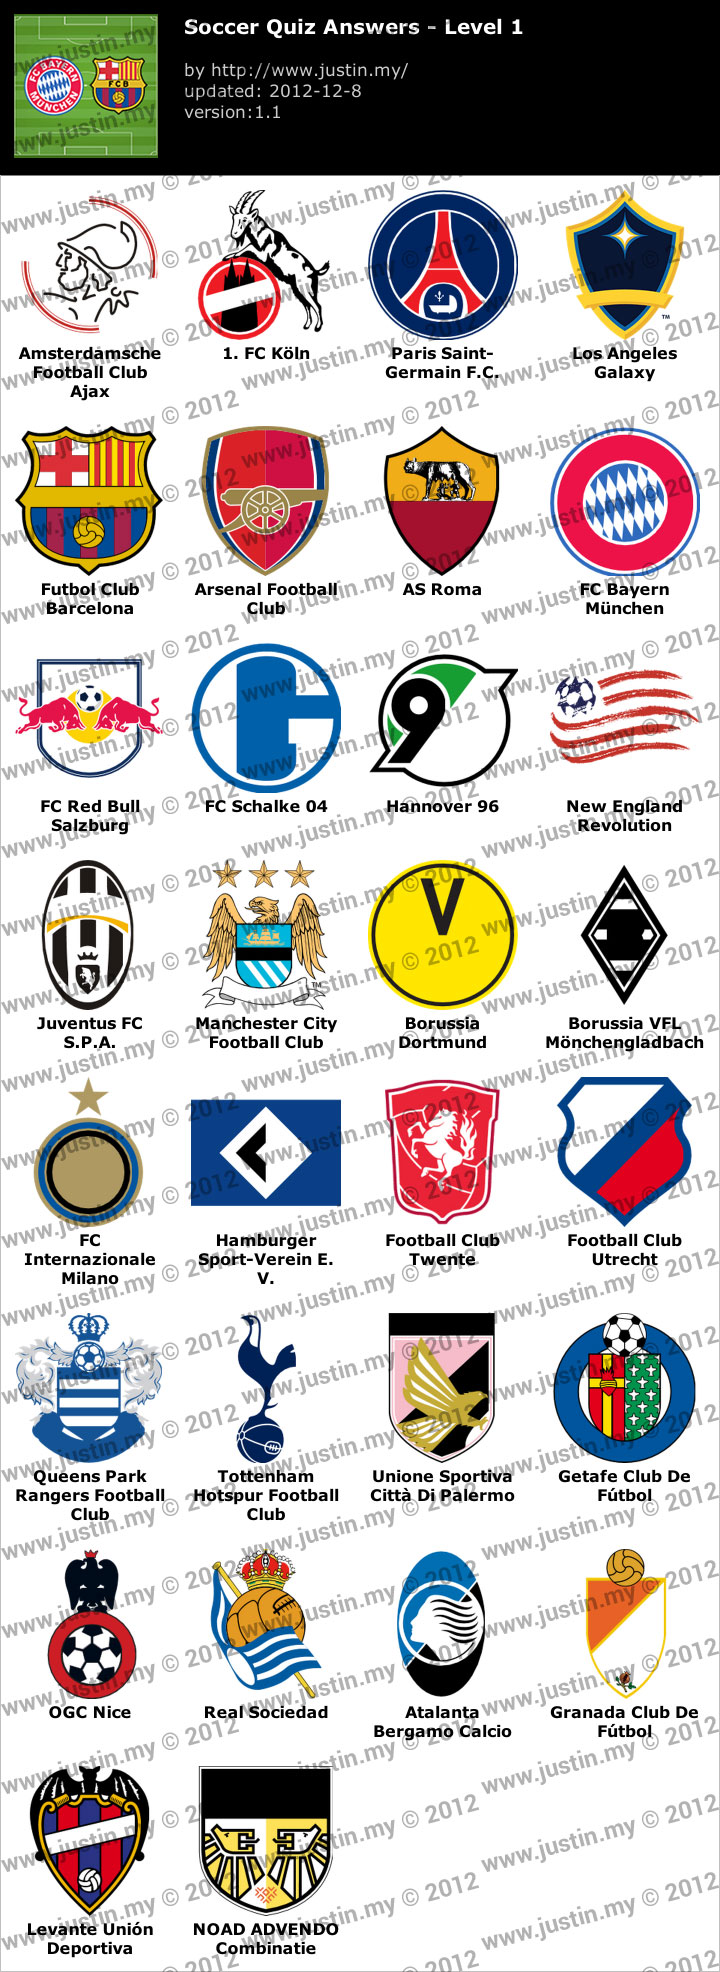 Soccer Quiz Level 1